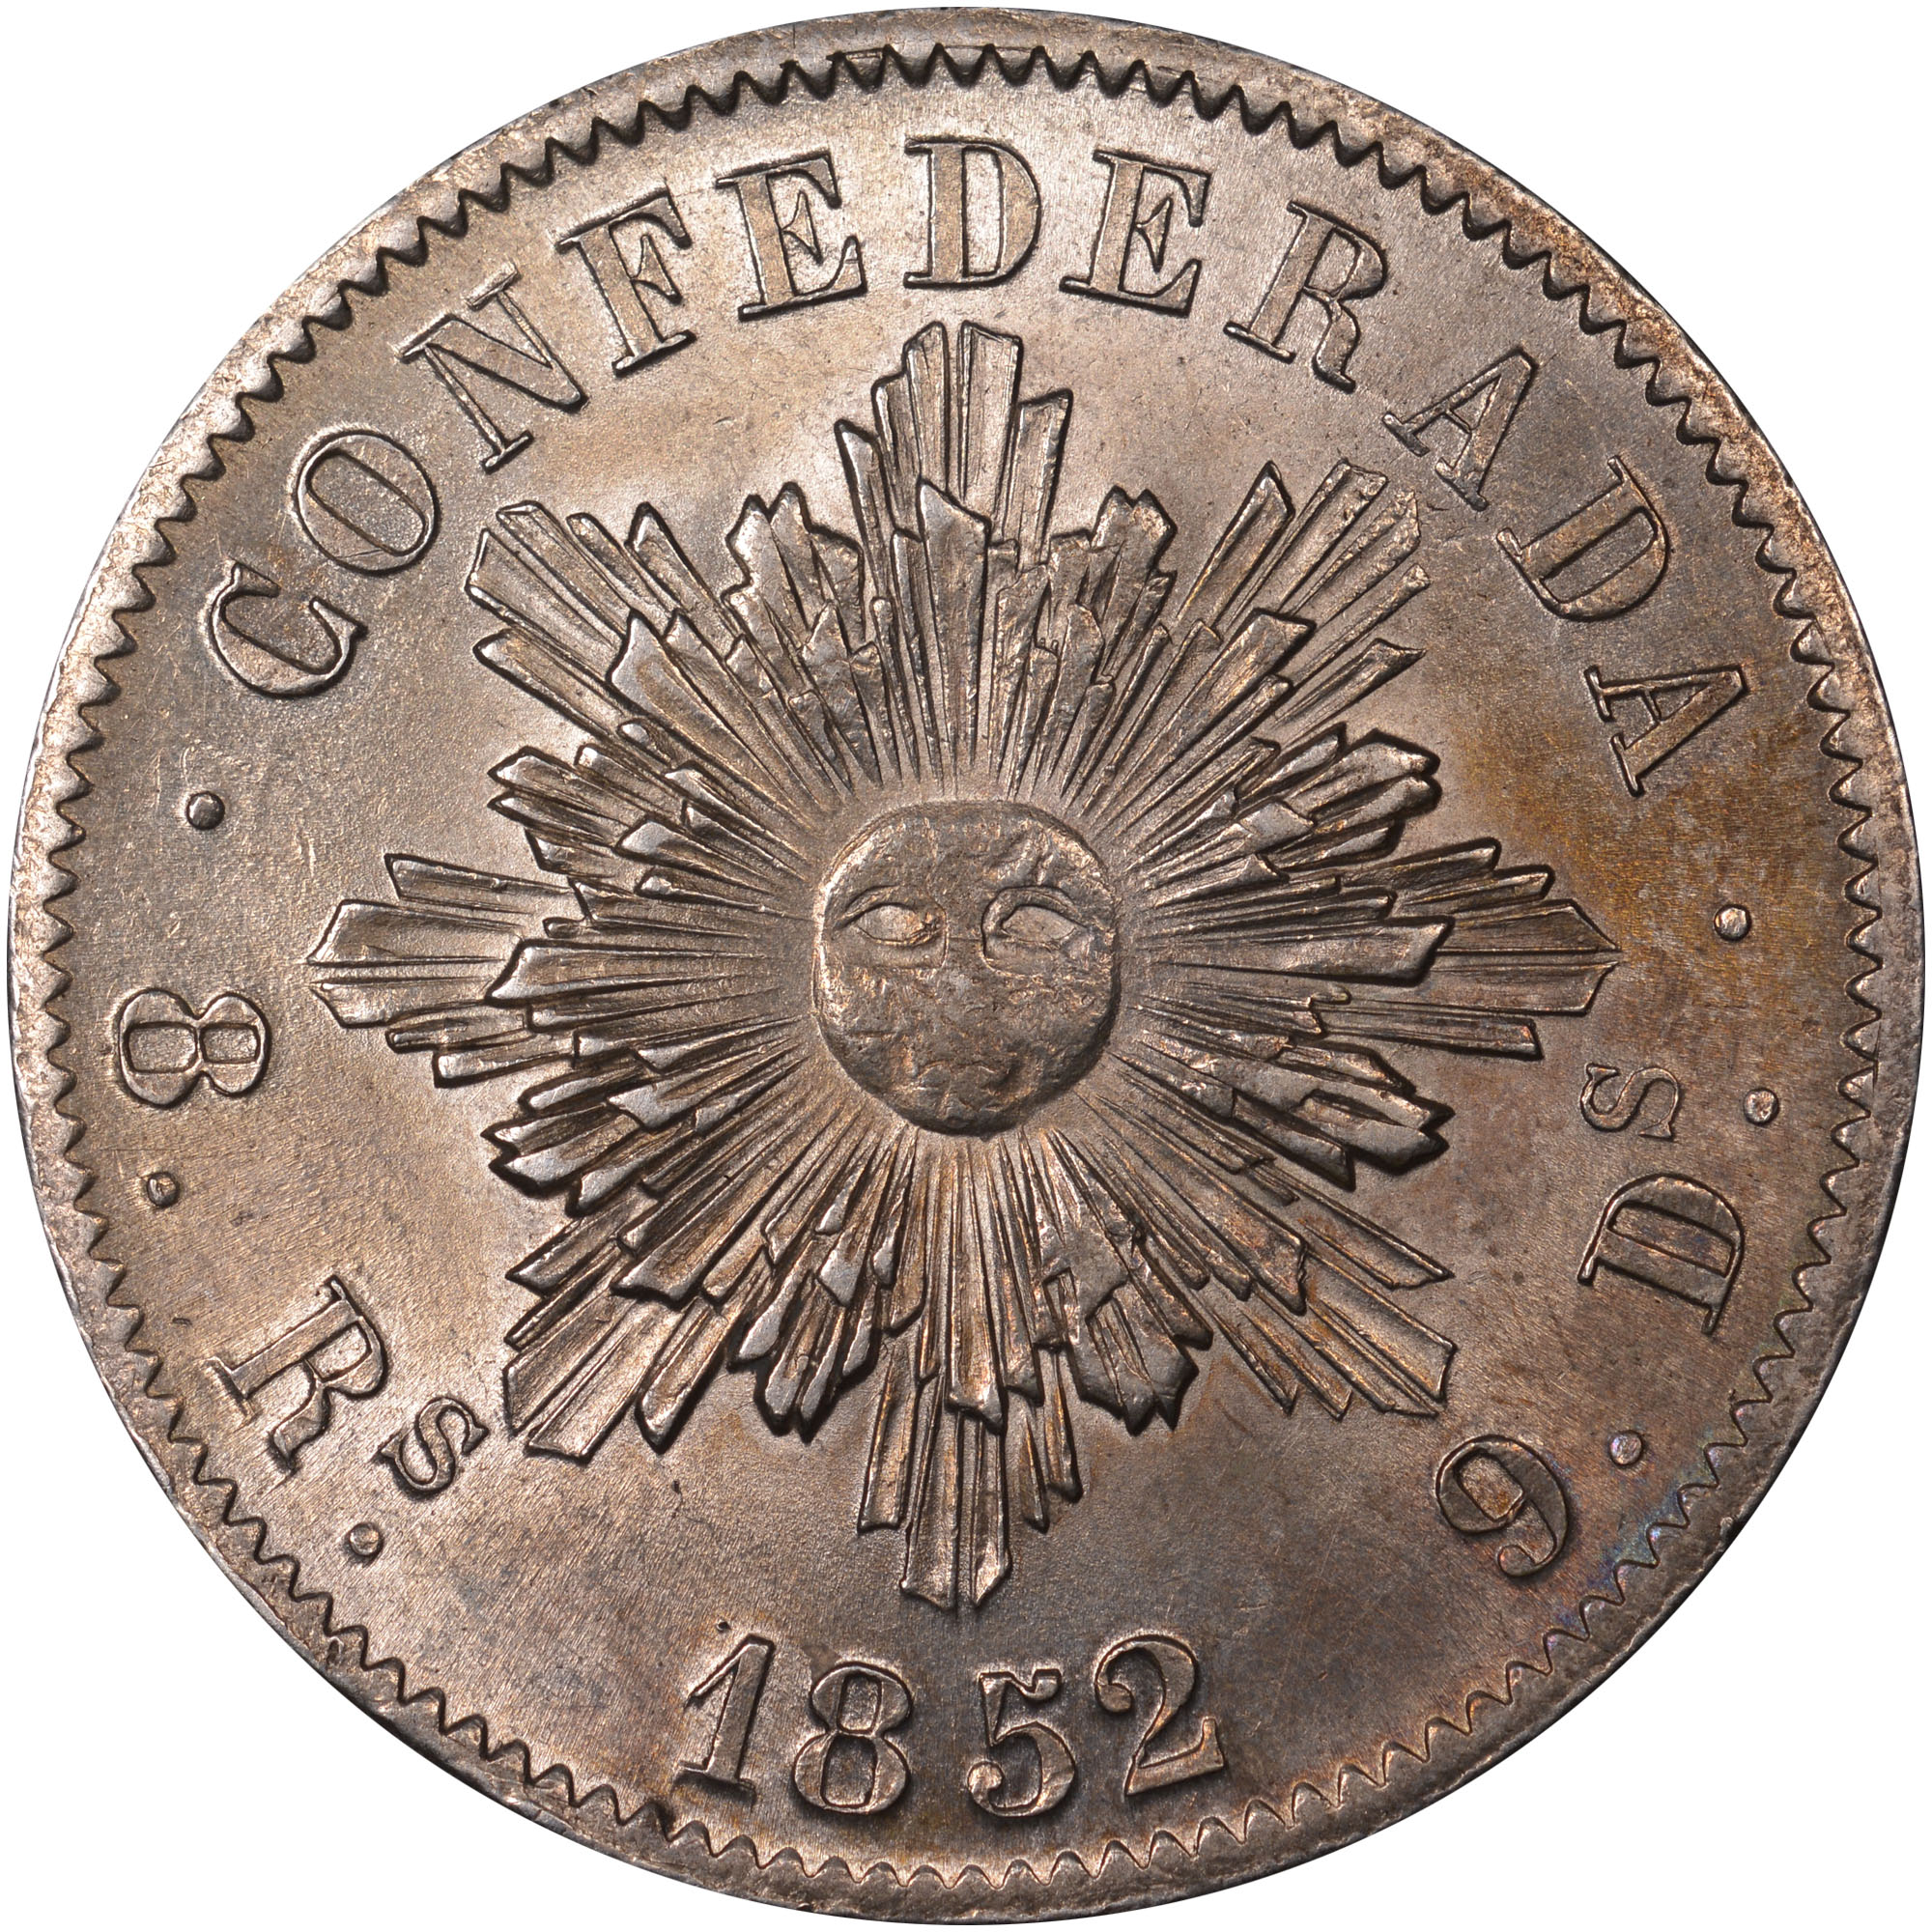 1852 Argentina CORDOBA 8 Reales reverse